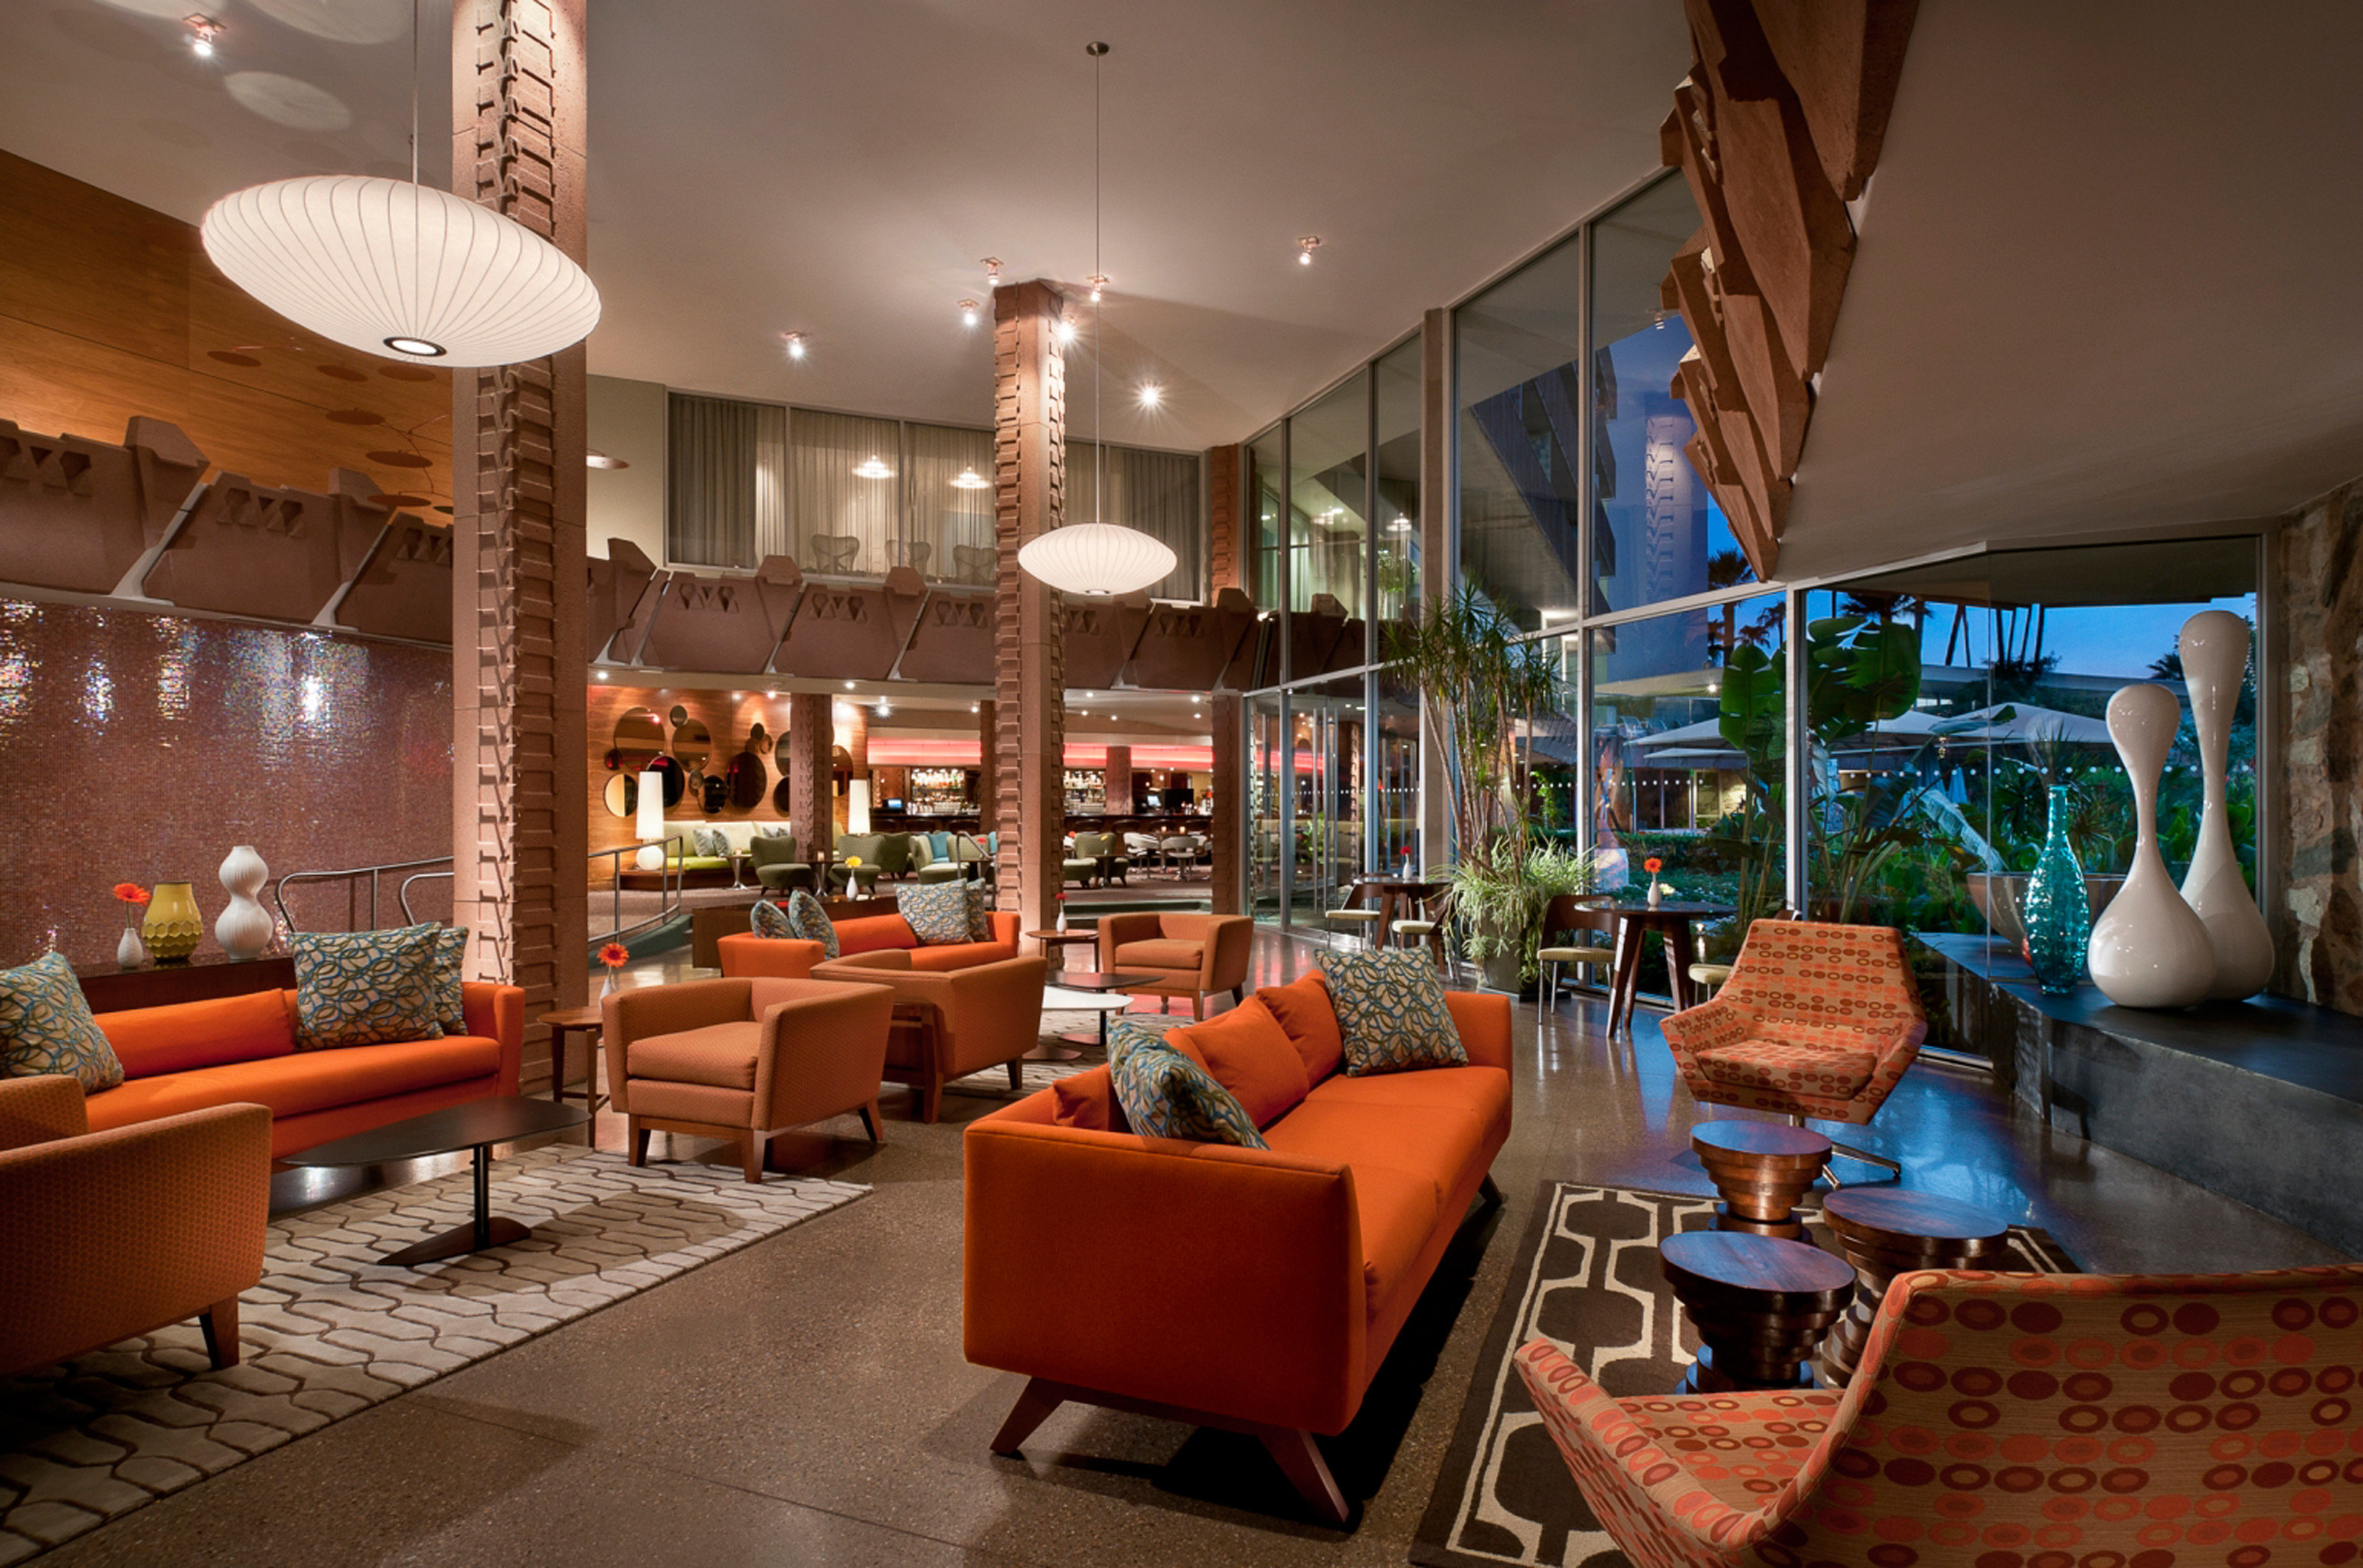 Lounge Luxury Scenic views chair Lobby home living room Resort restaurant Dining orange Bar